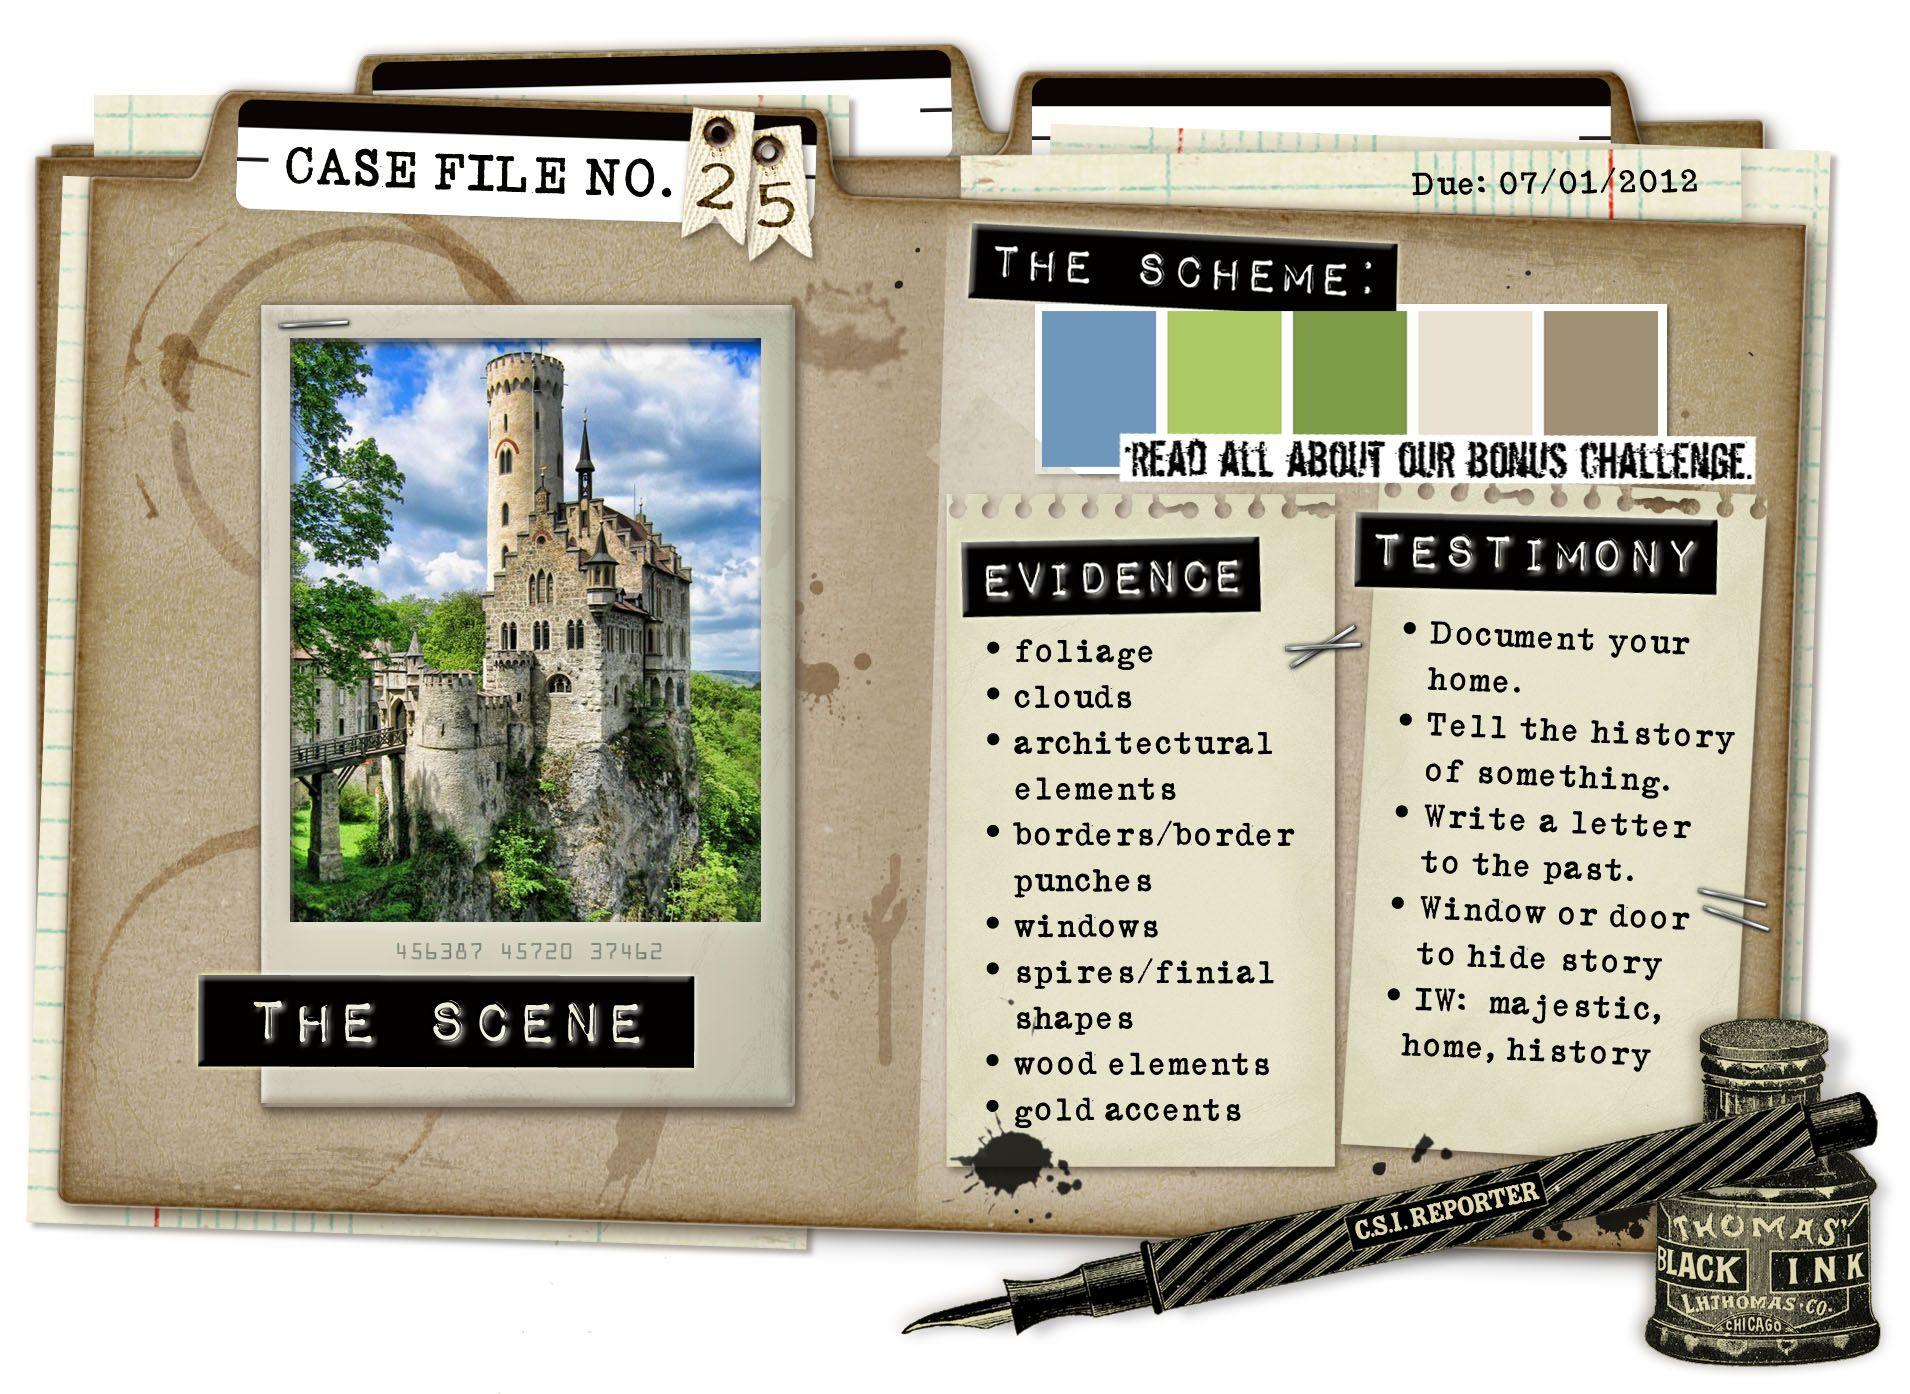 Case File No. 25 {Case Closes on July 1, 2012} - CSI: Color, Stories, Inspiration